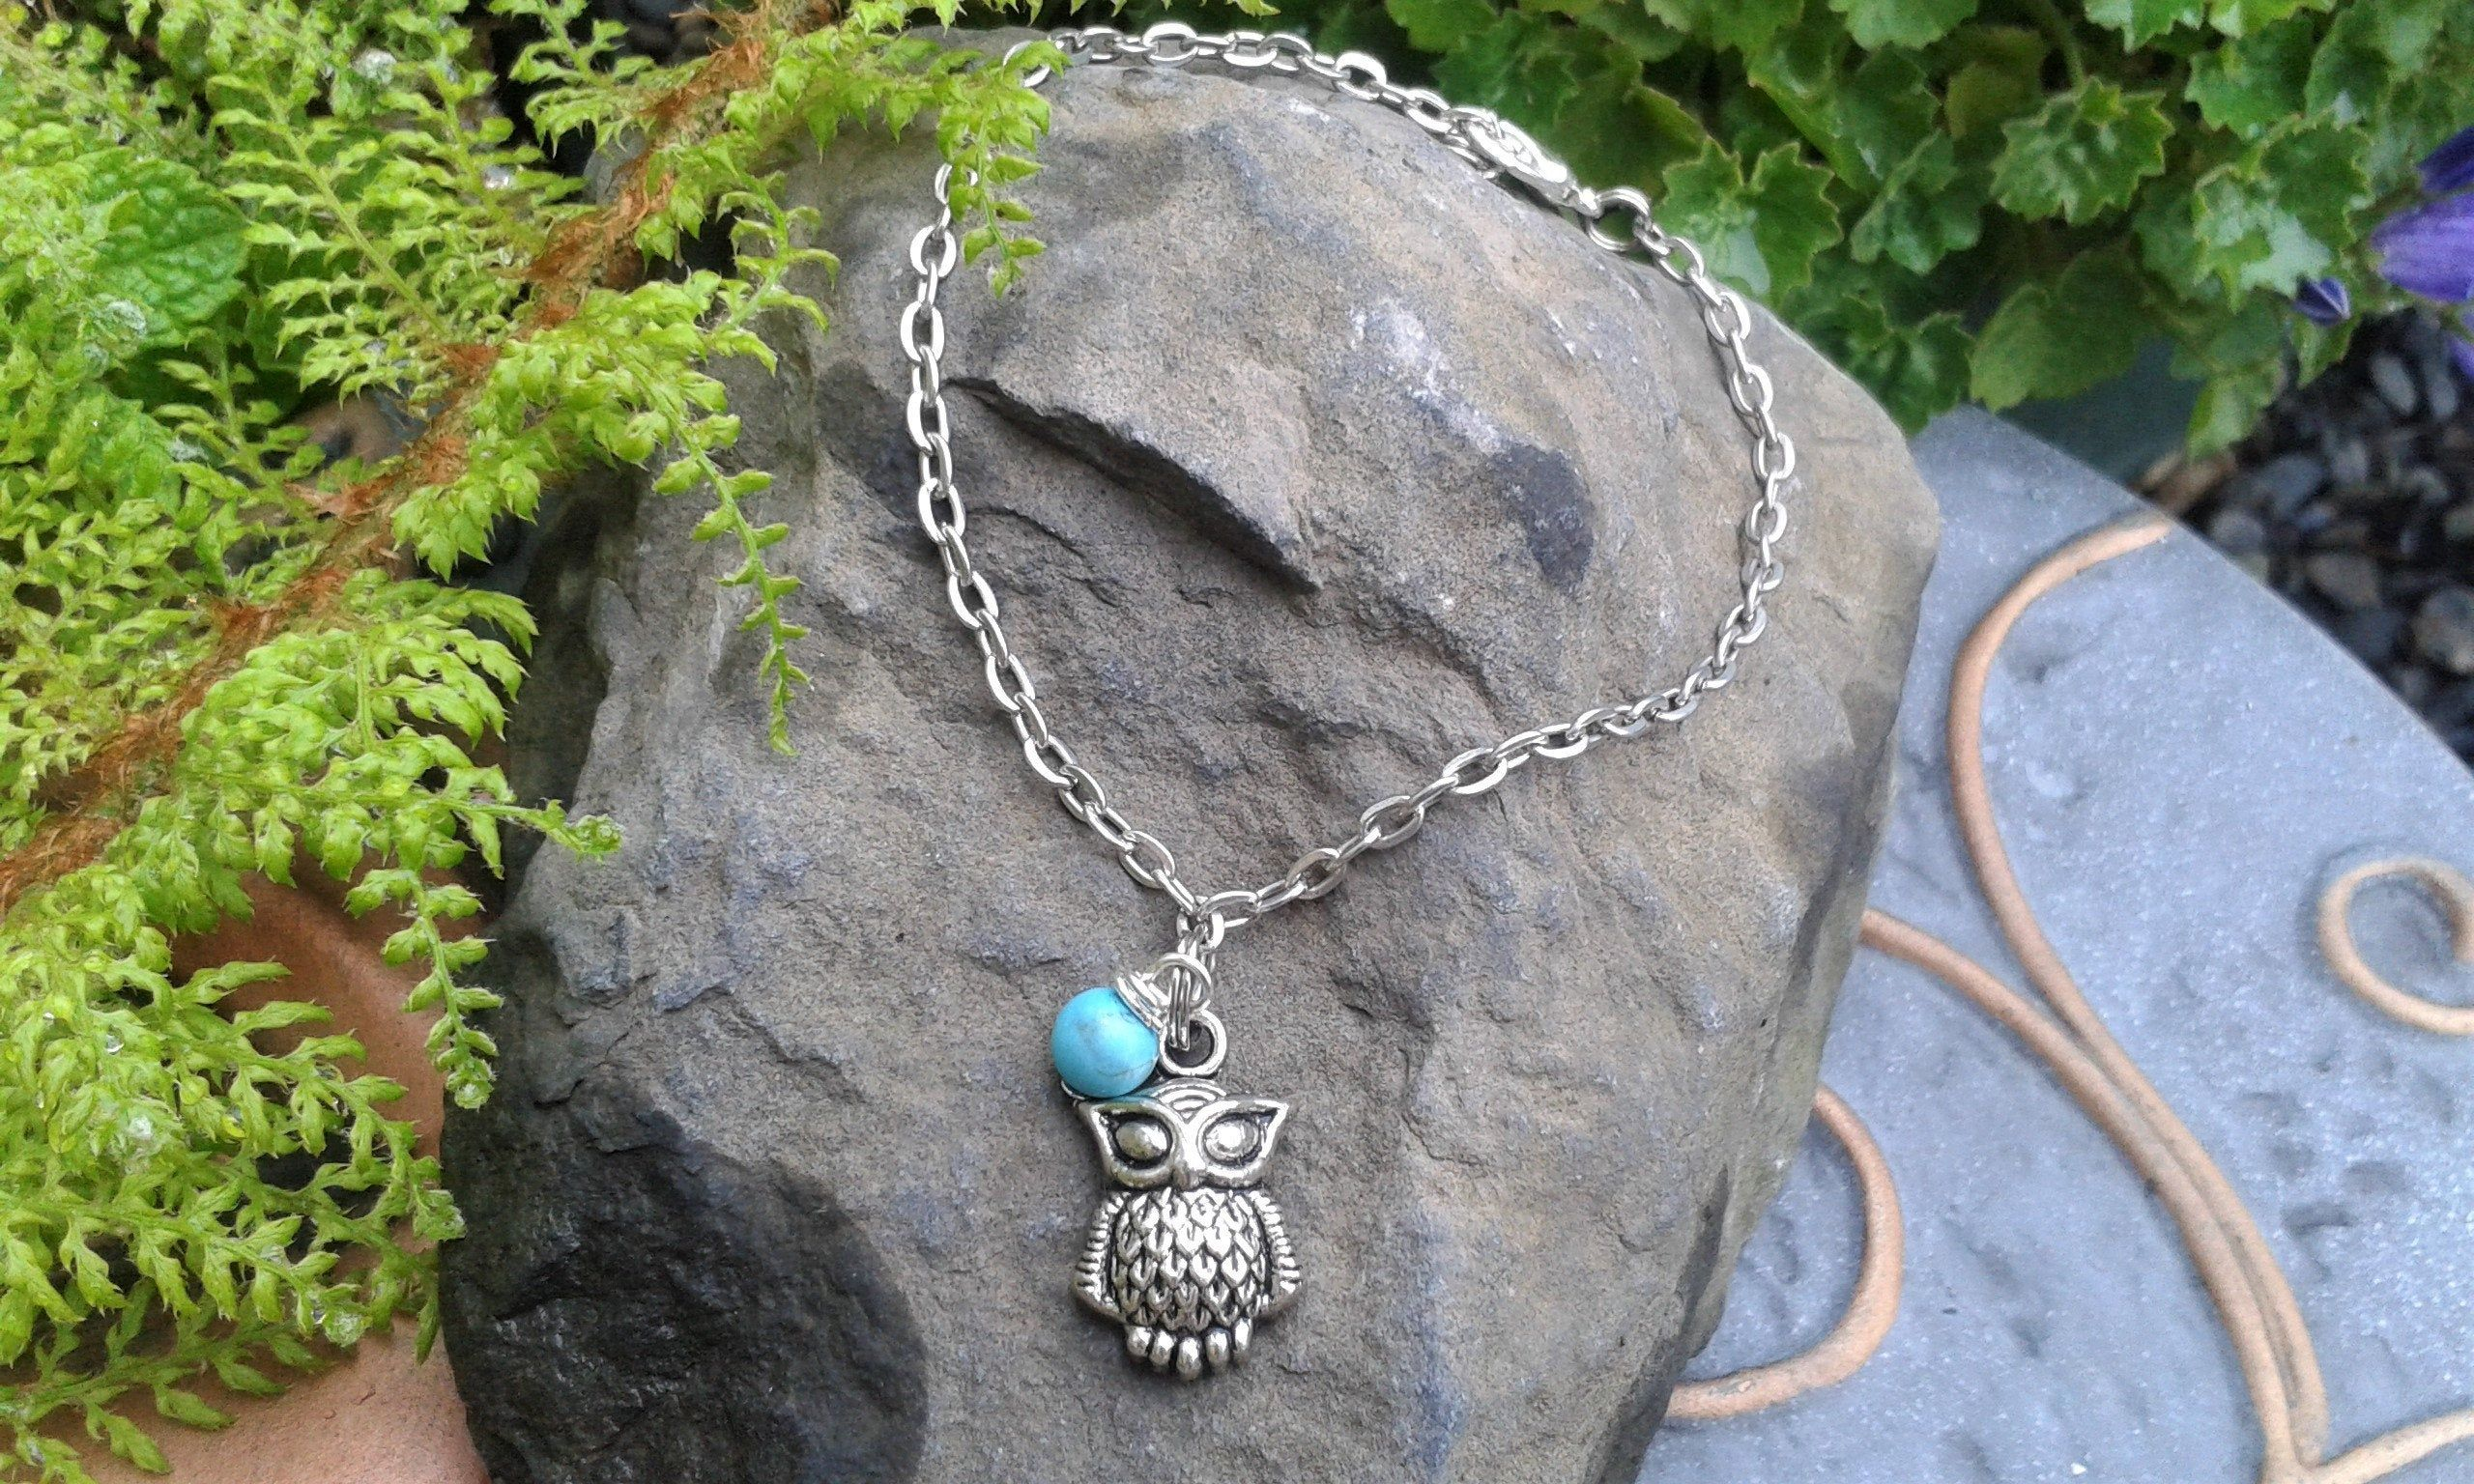 Owl Ankle Bracelet Anklet Charm